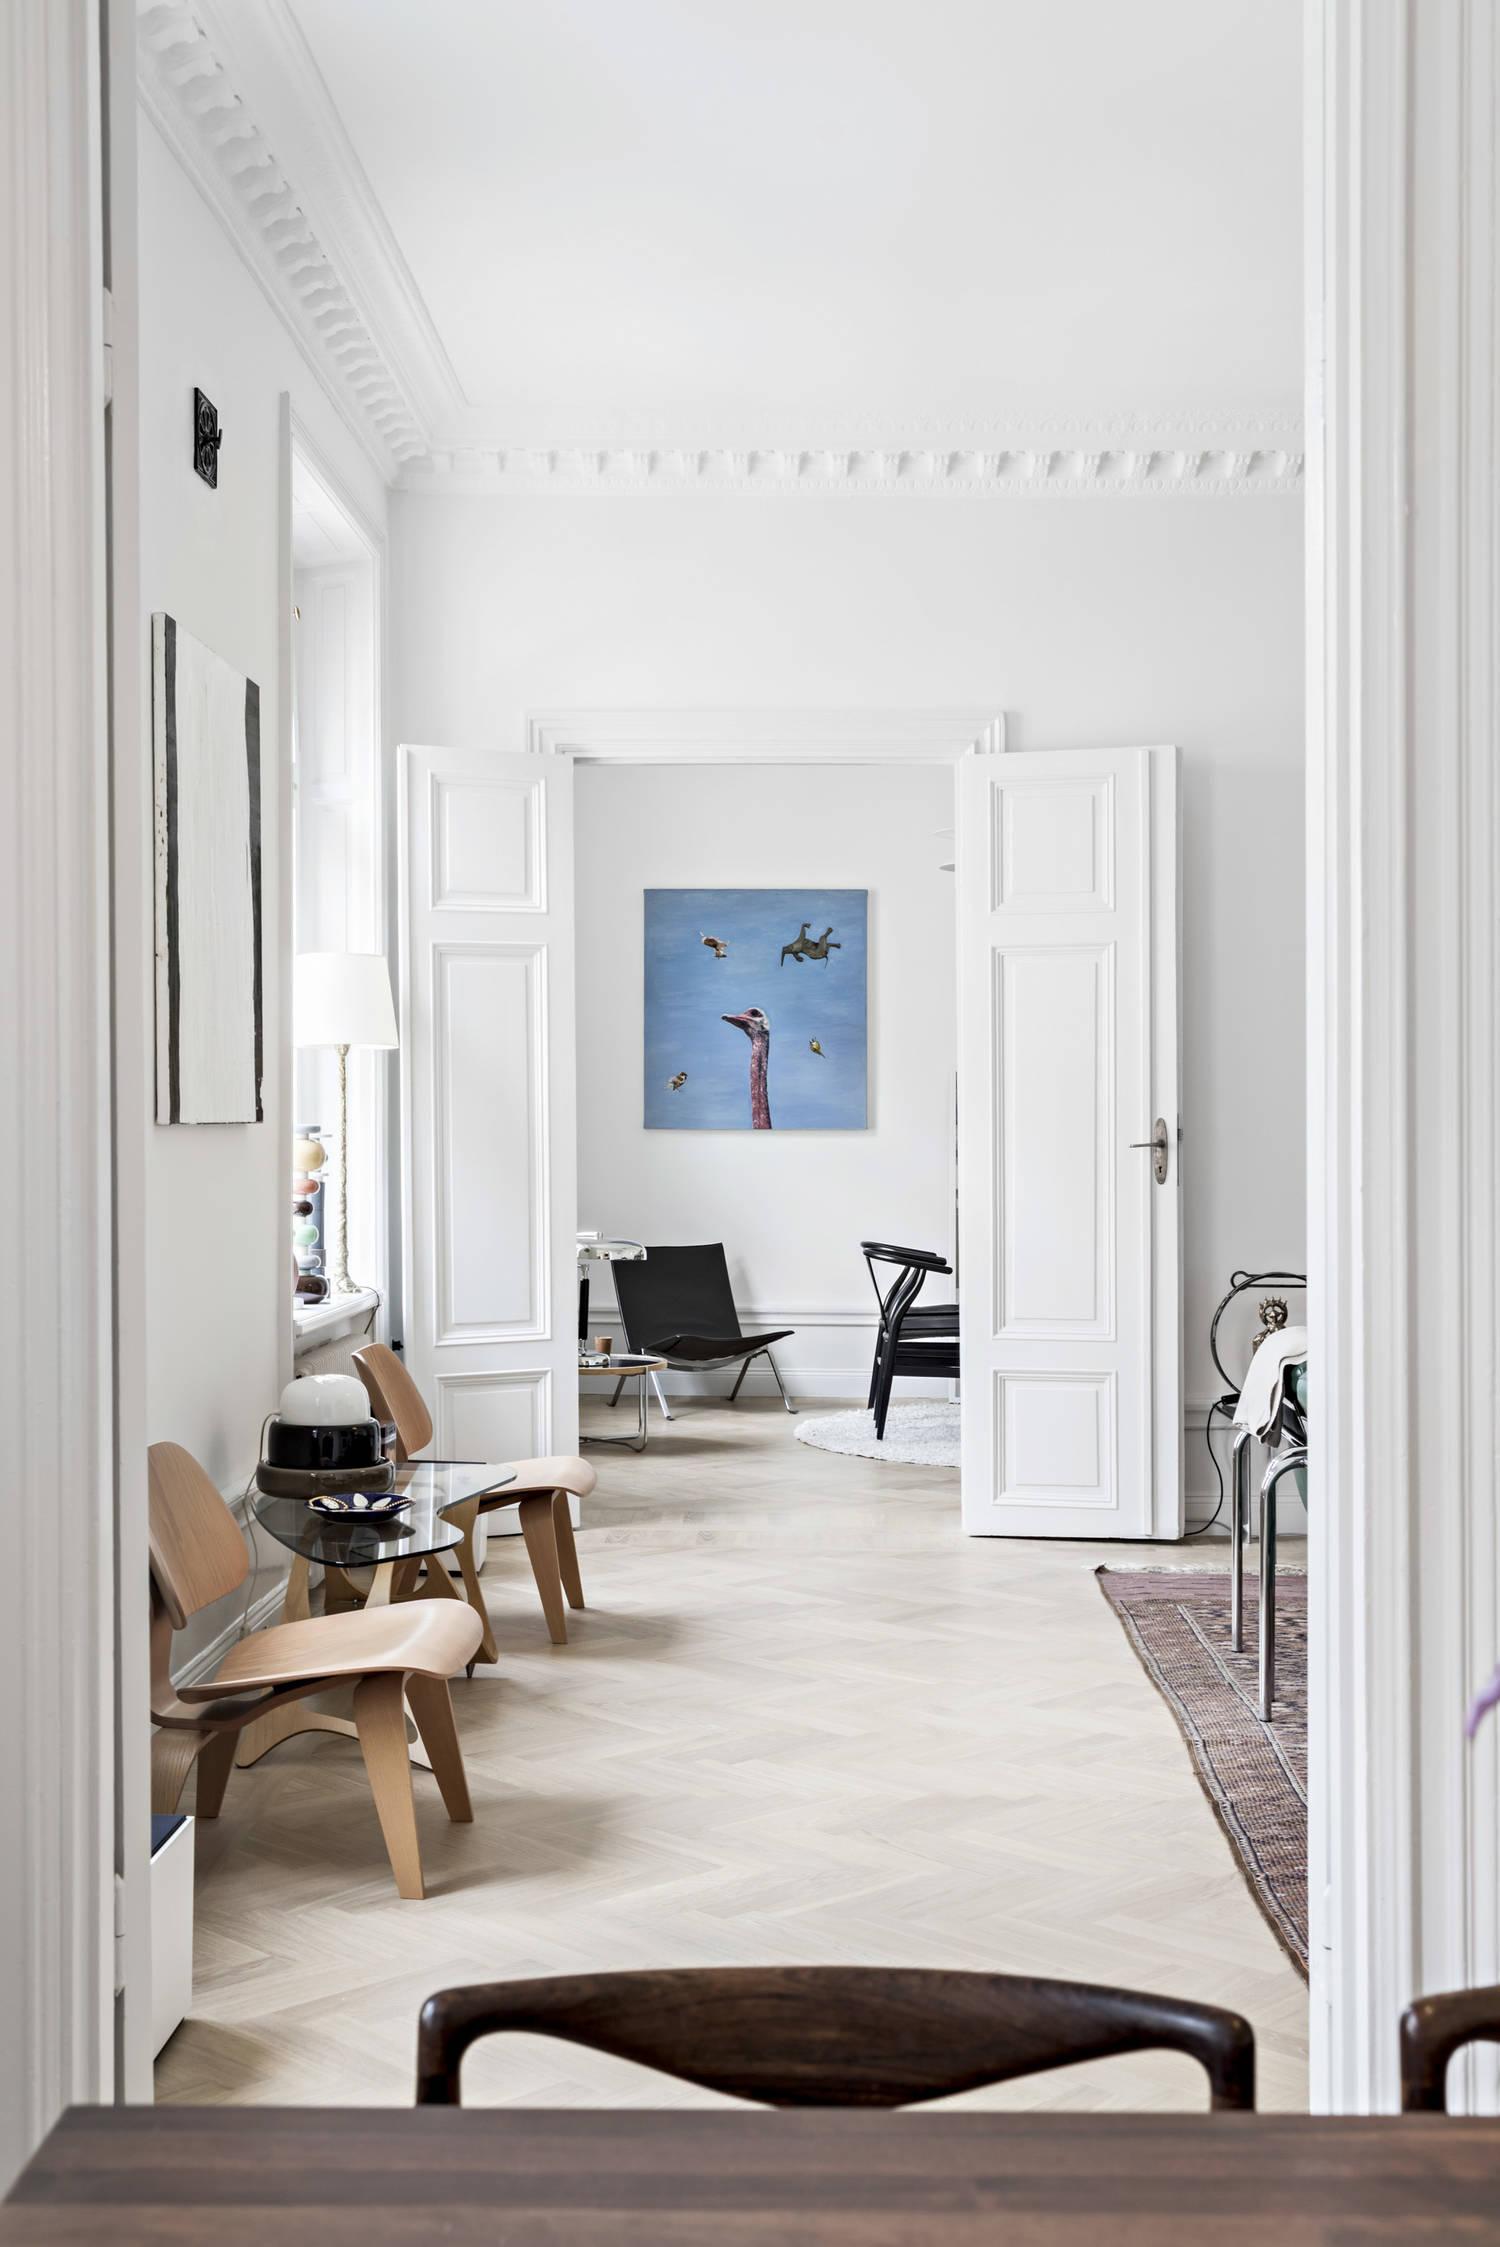 Sofia CM Interior blog Swedish homes scandi style scandinavian decoration blog switzerland